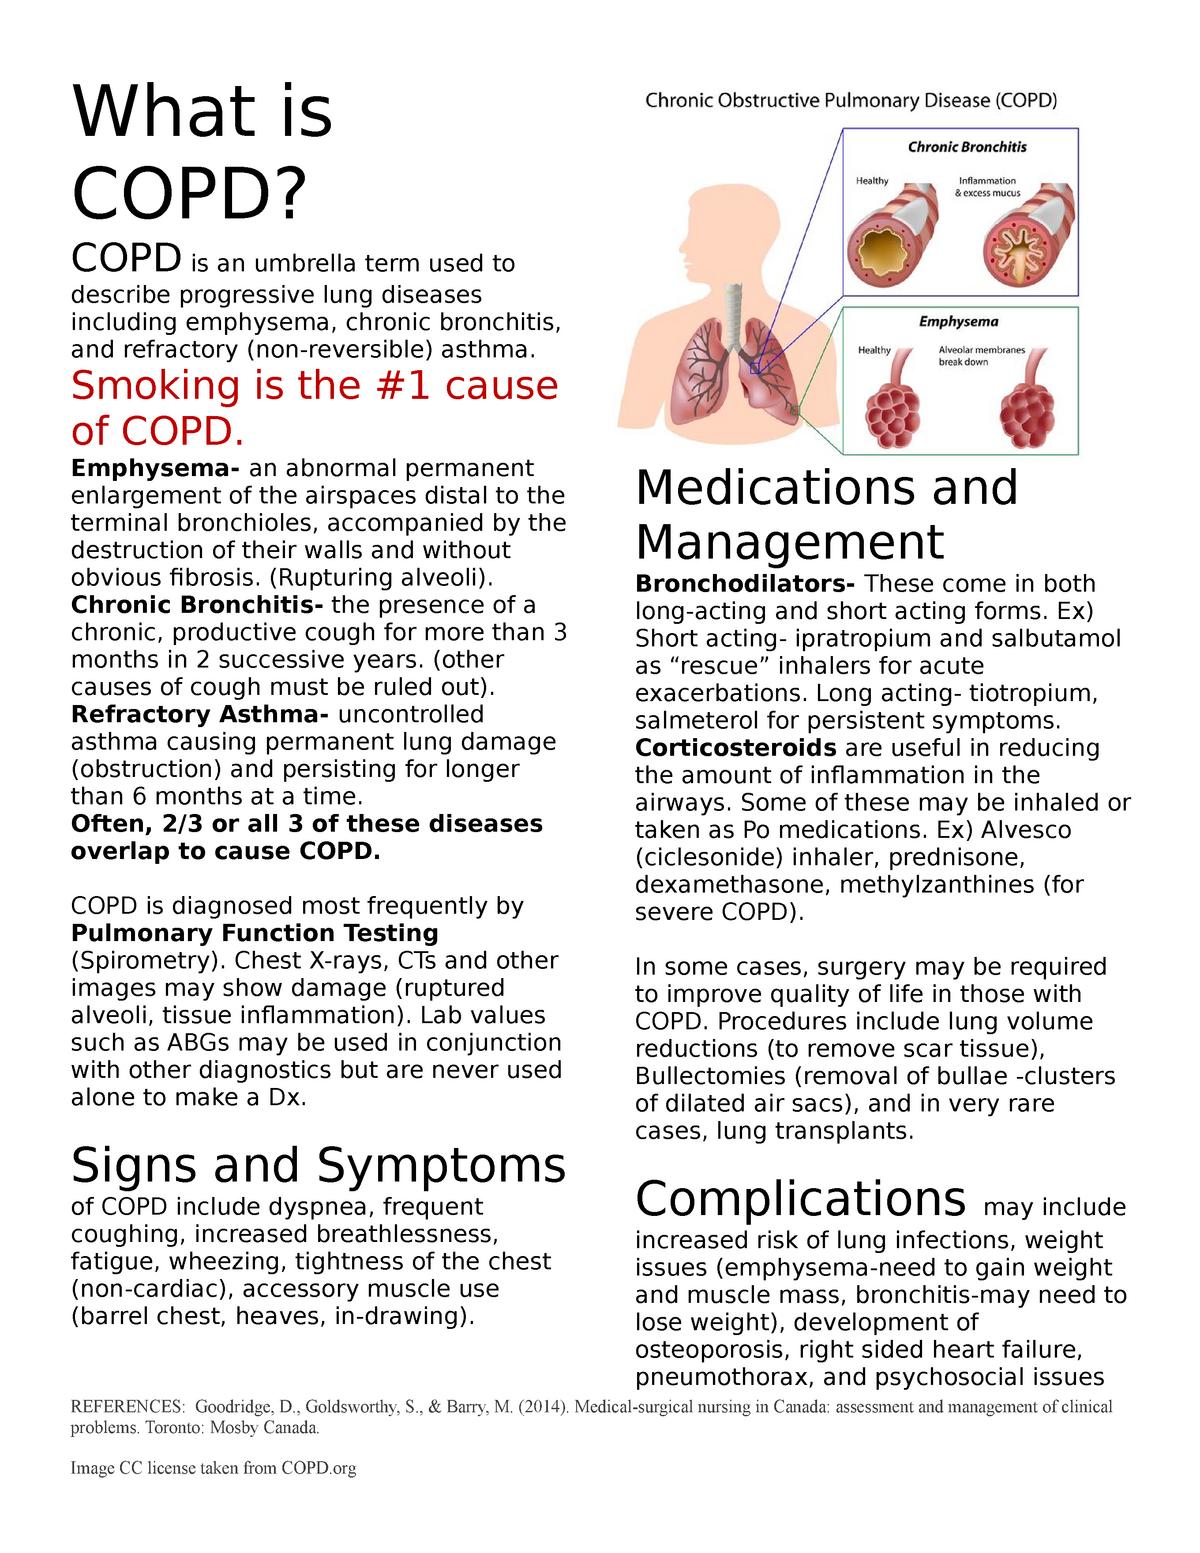 COPD Fact Sheet - CNUR 206: Practice Education: Acute Care